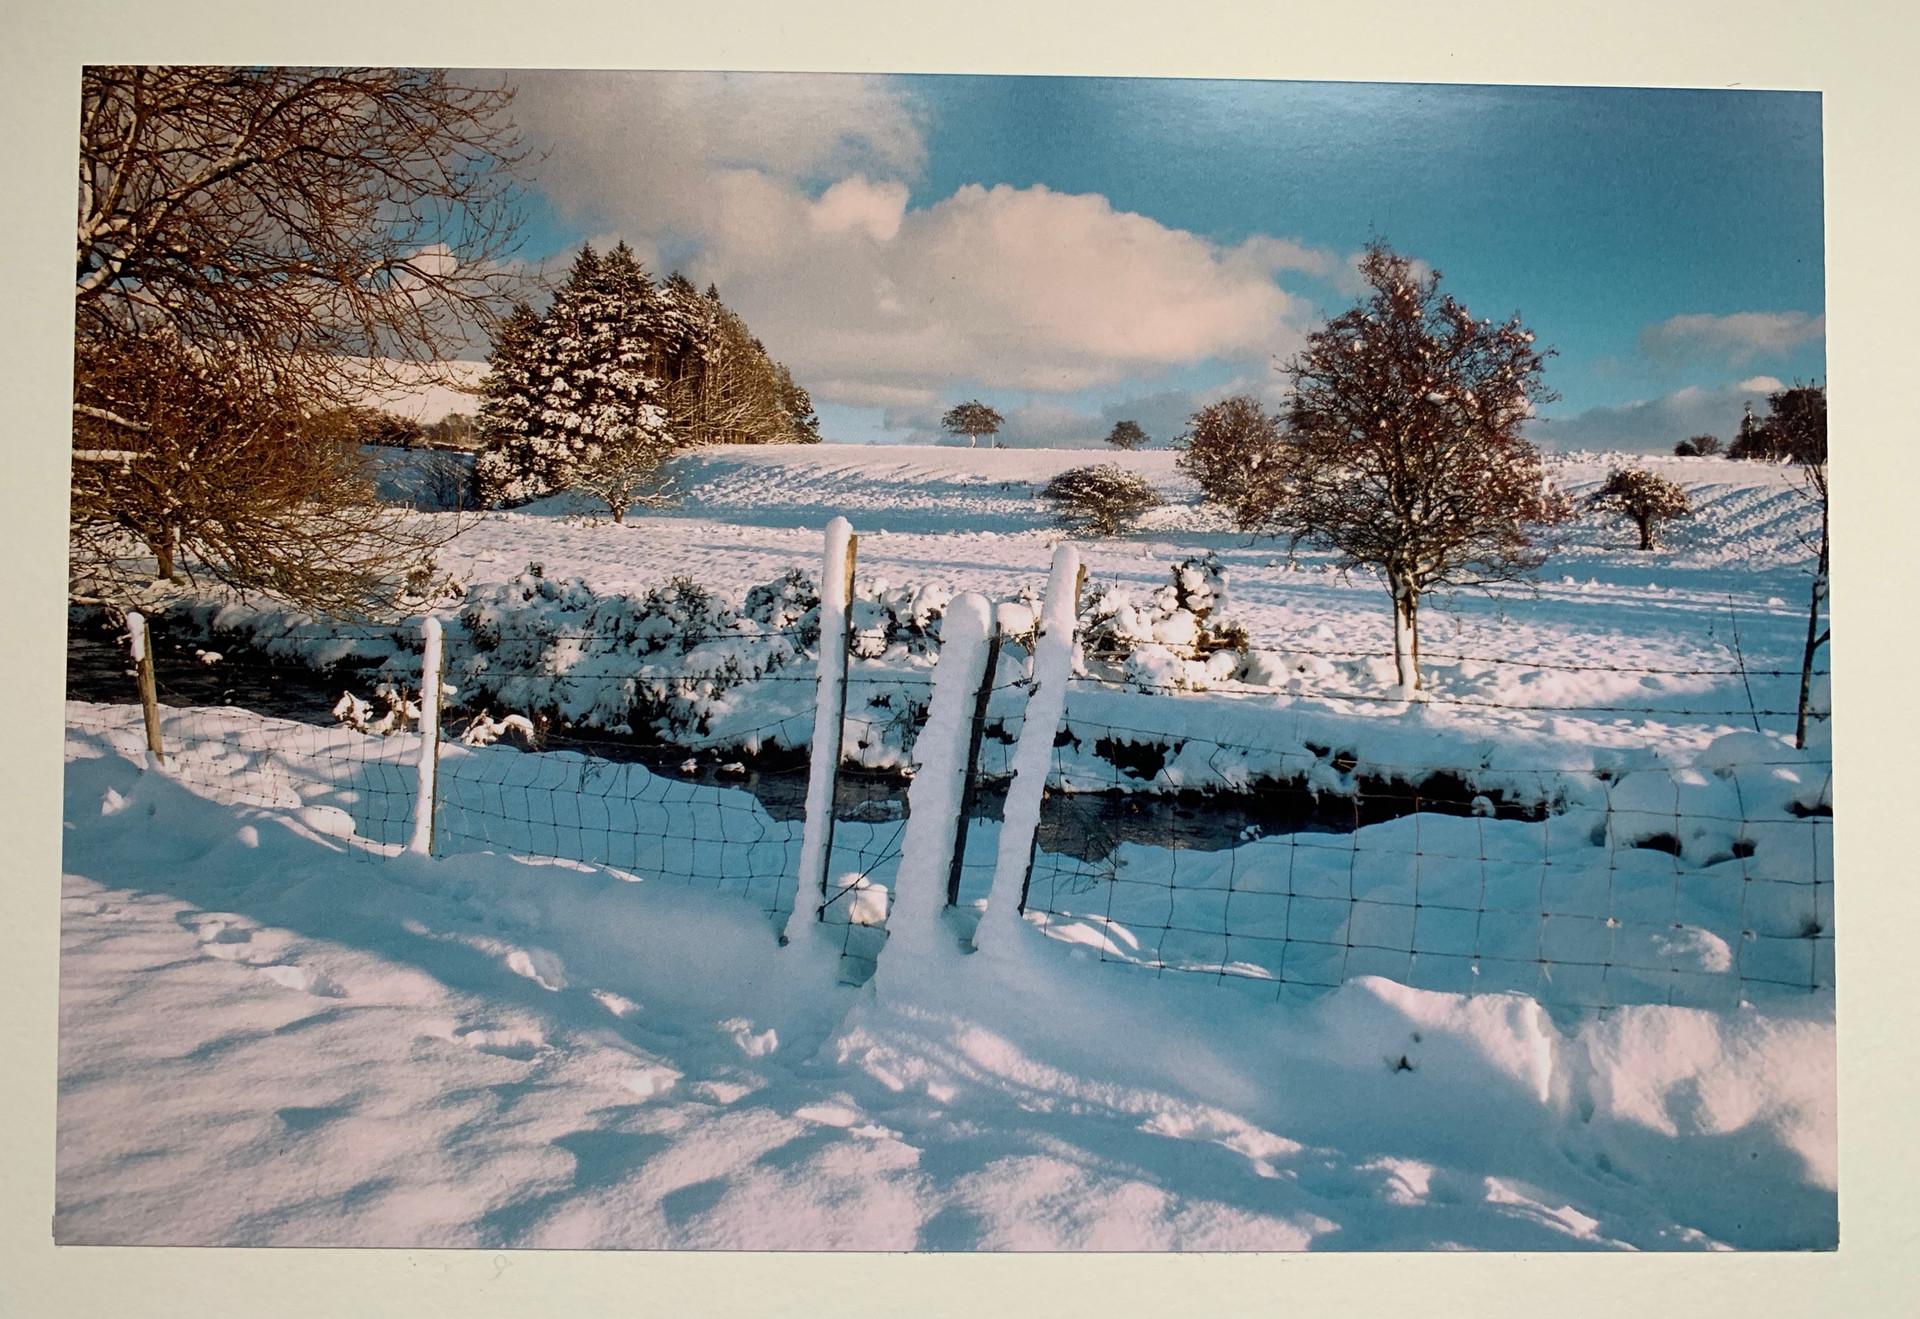 COLOUR - Winter Wonderland - Bing Crosby by Joe McKay (8 marks)